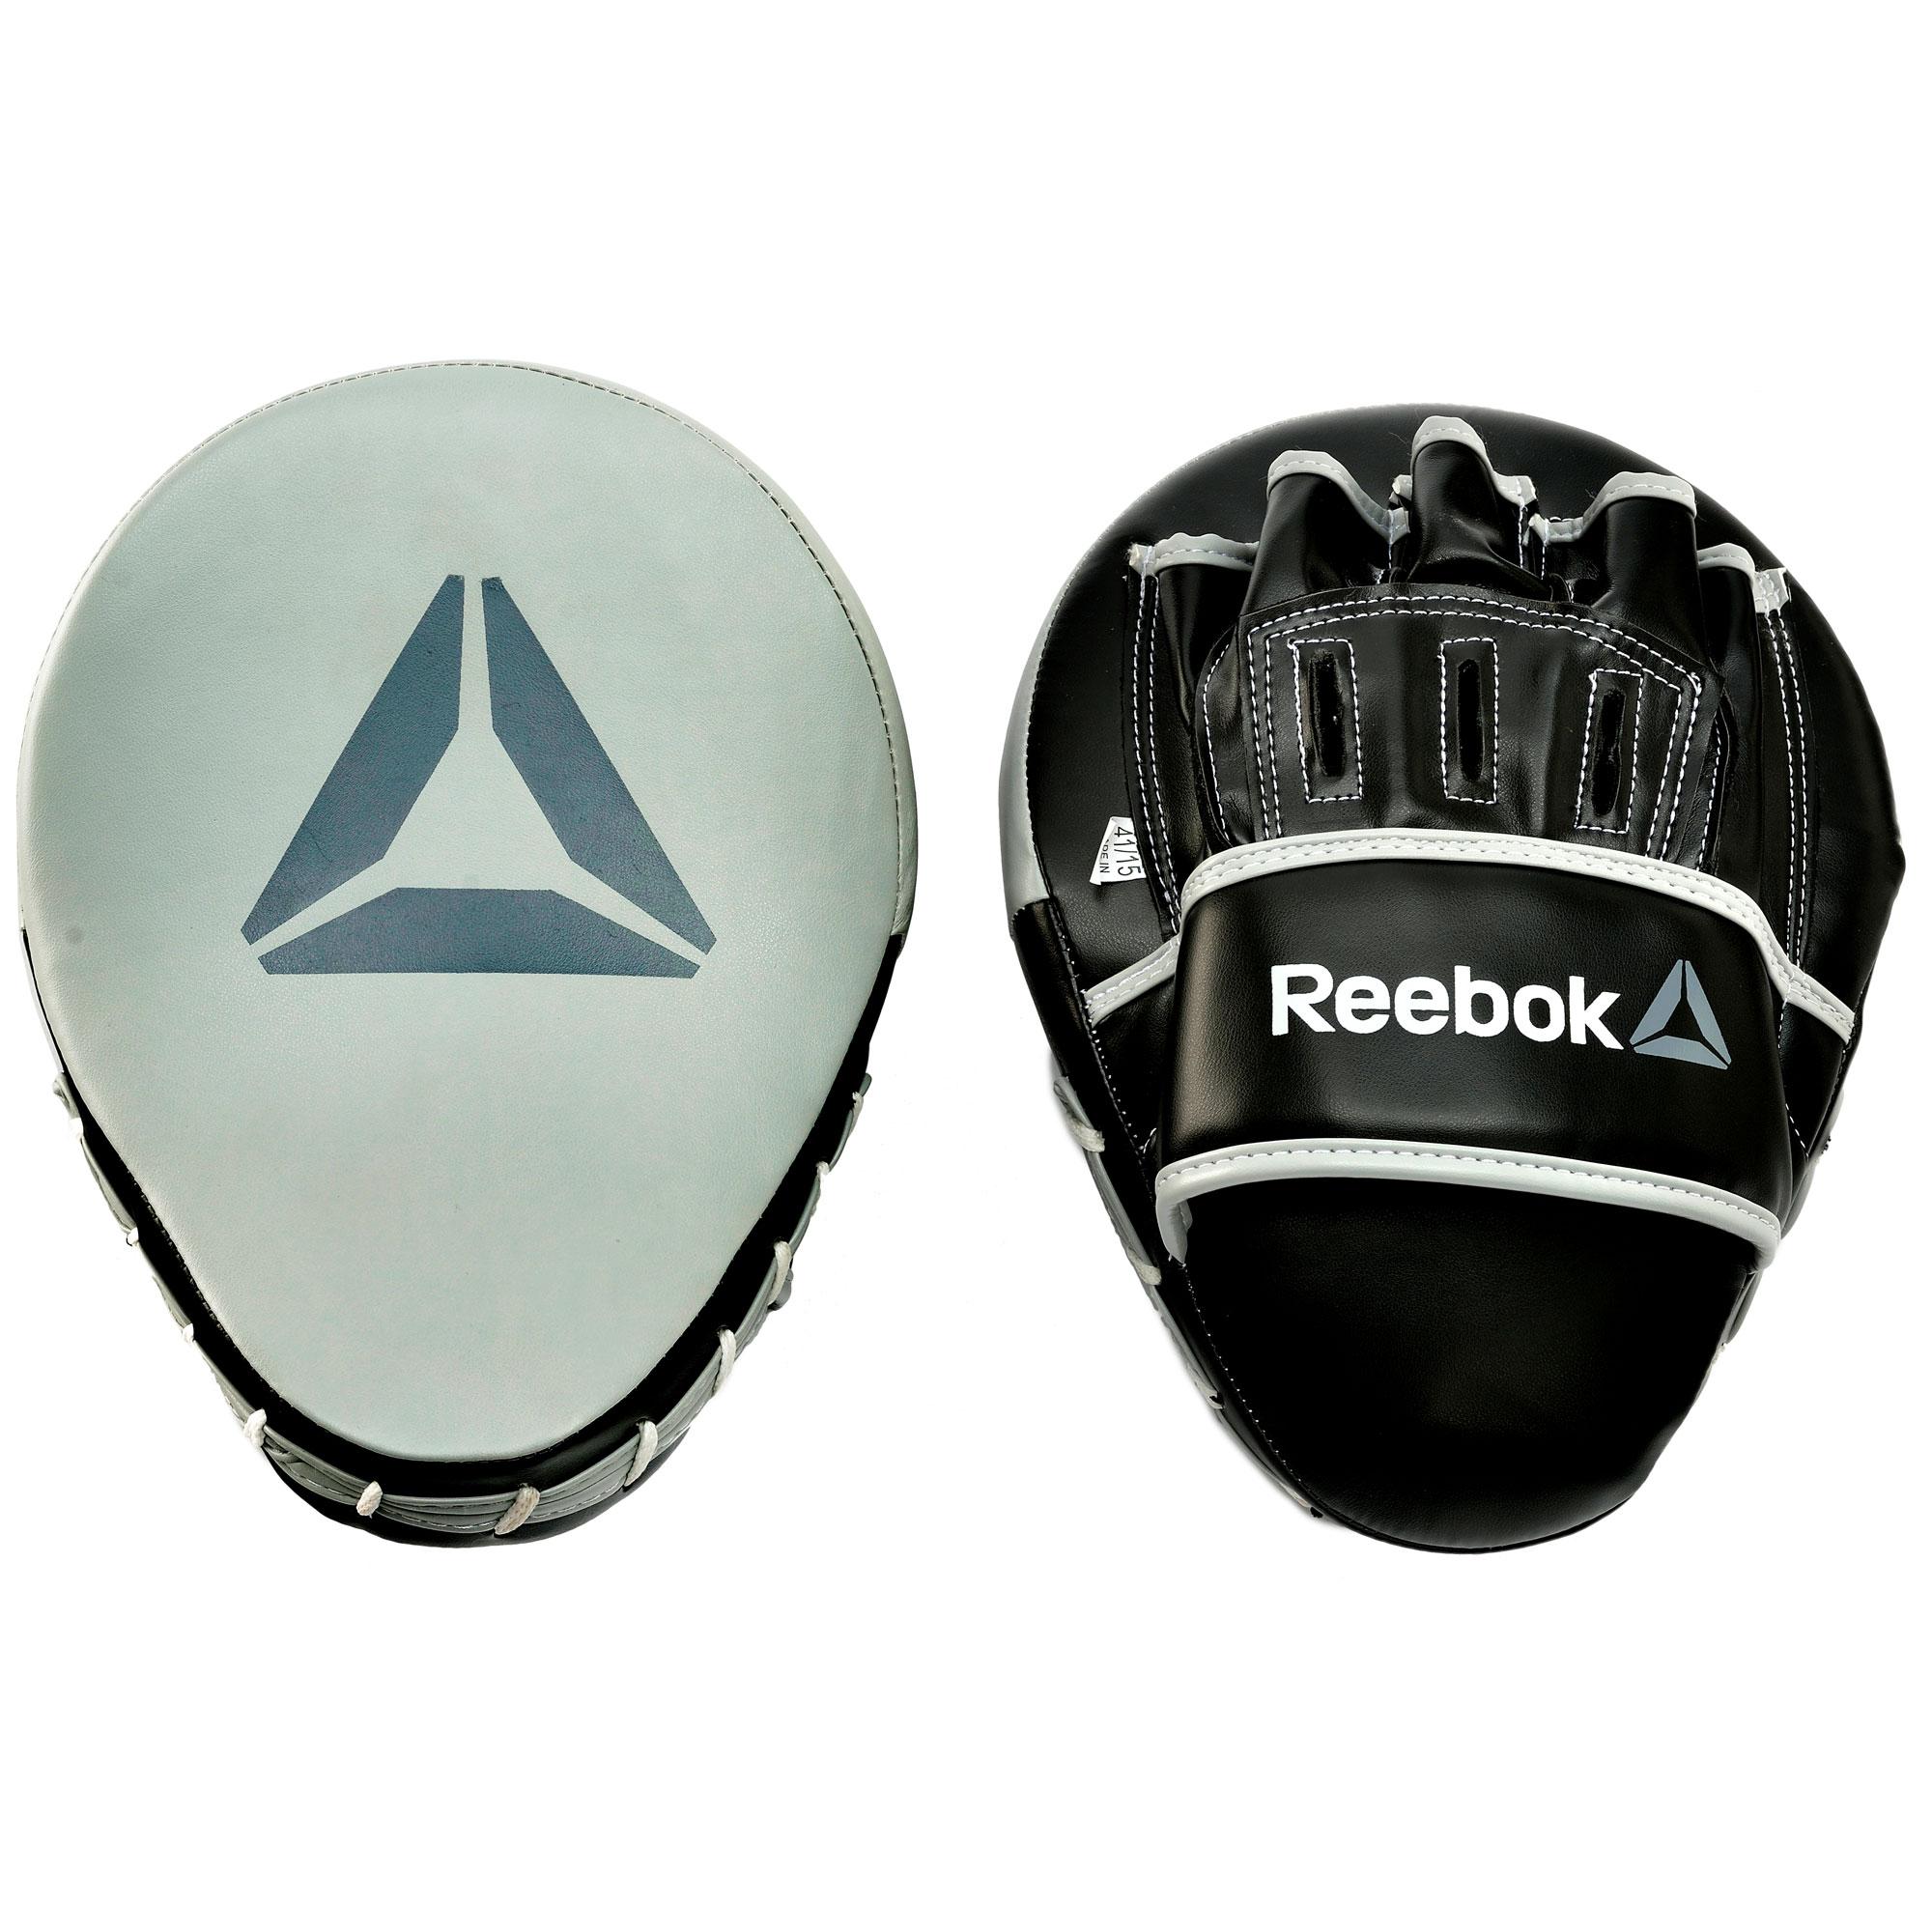 Reebok Combat Hook and Jab Pads - Black